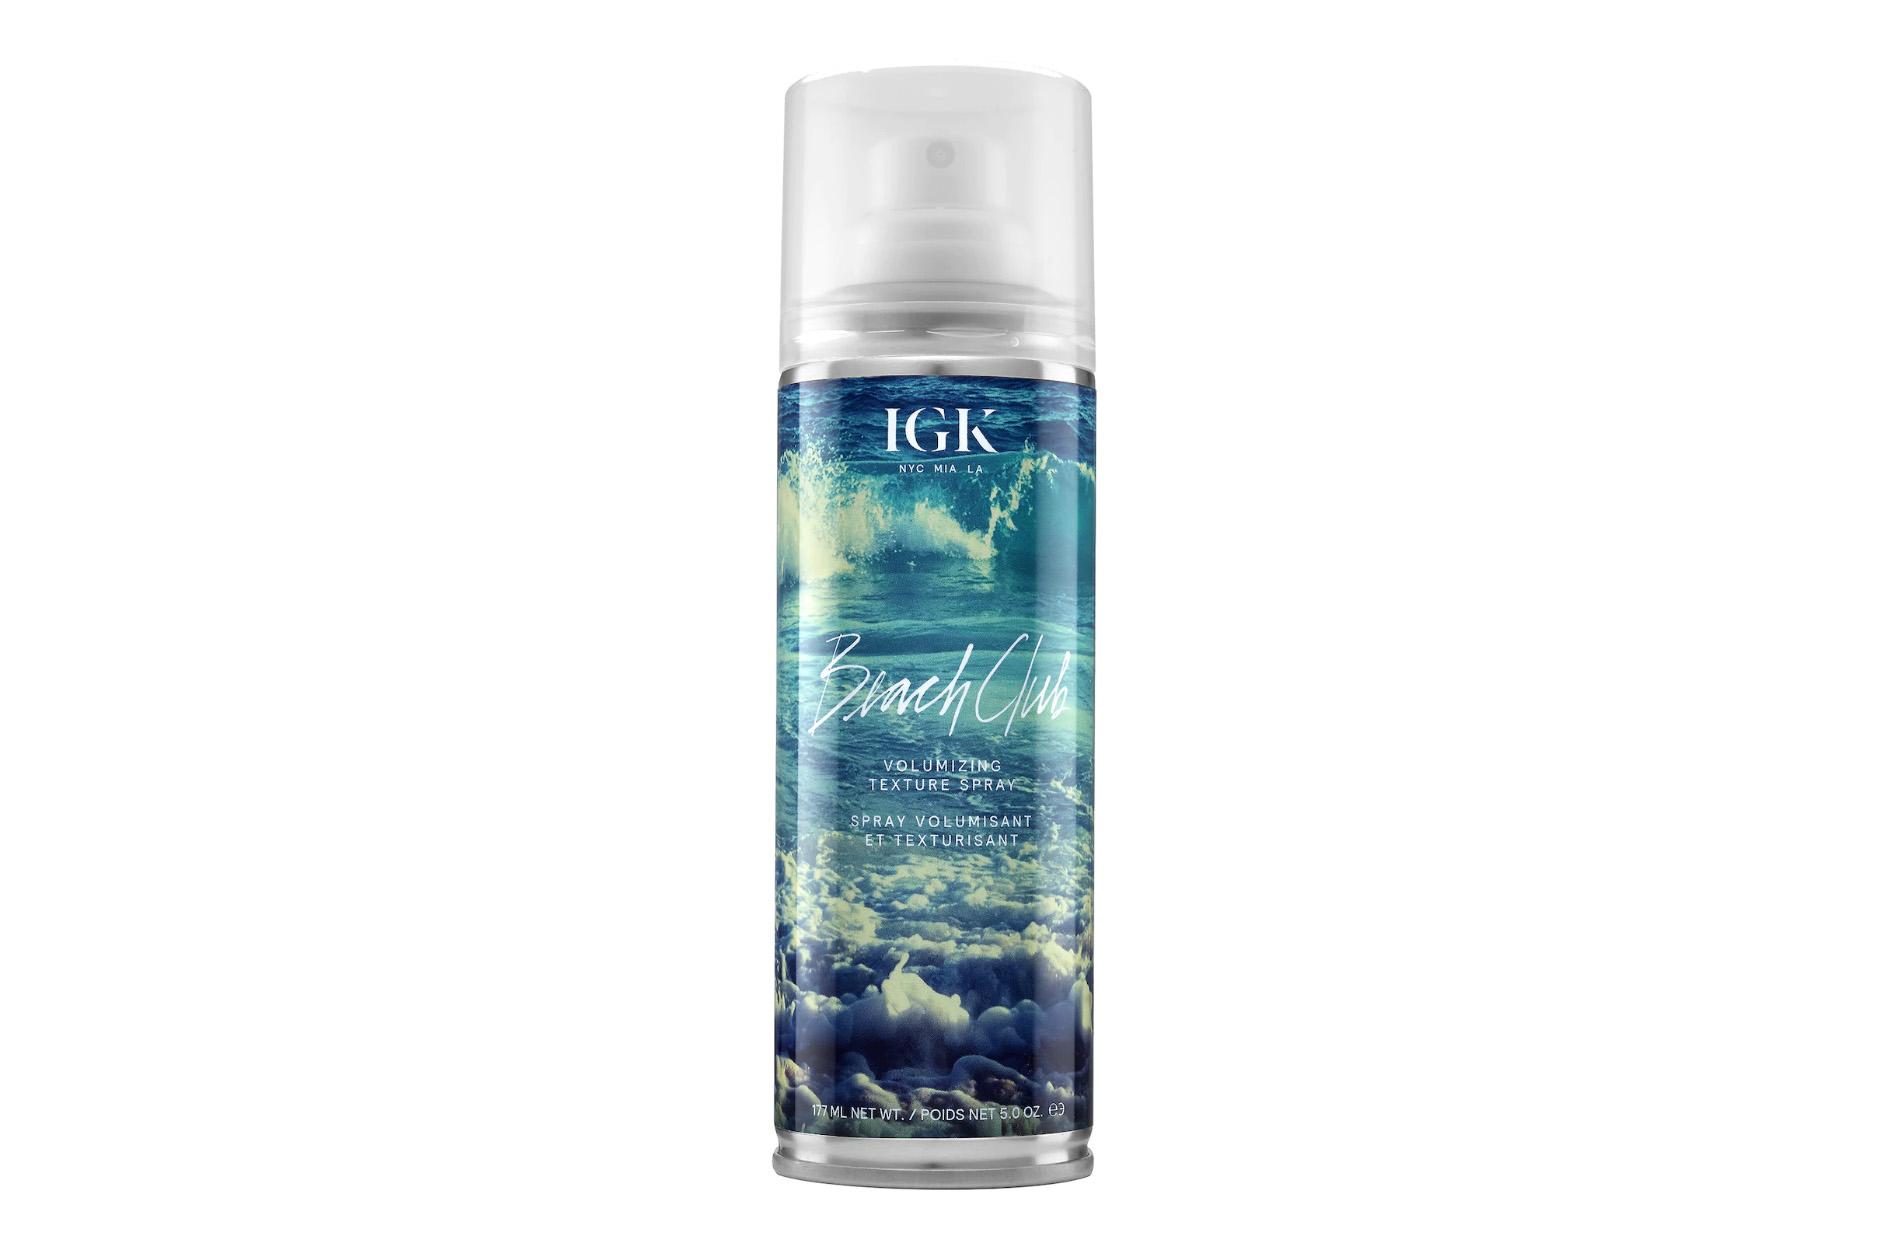 IGK Beach Club Texture Spray